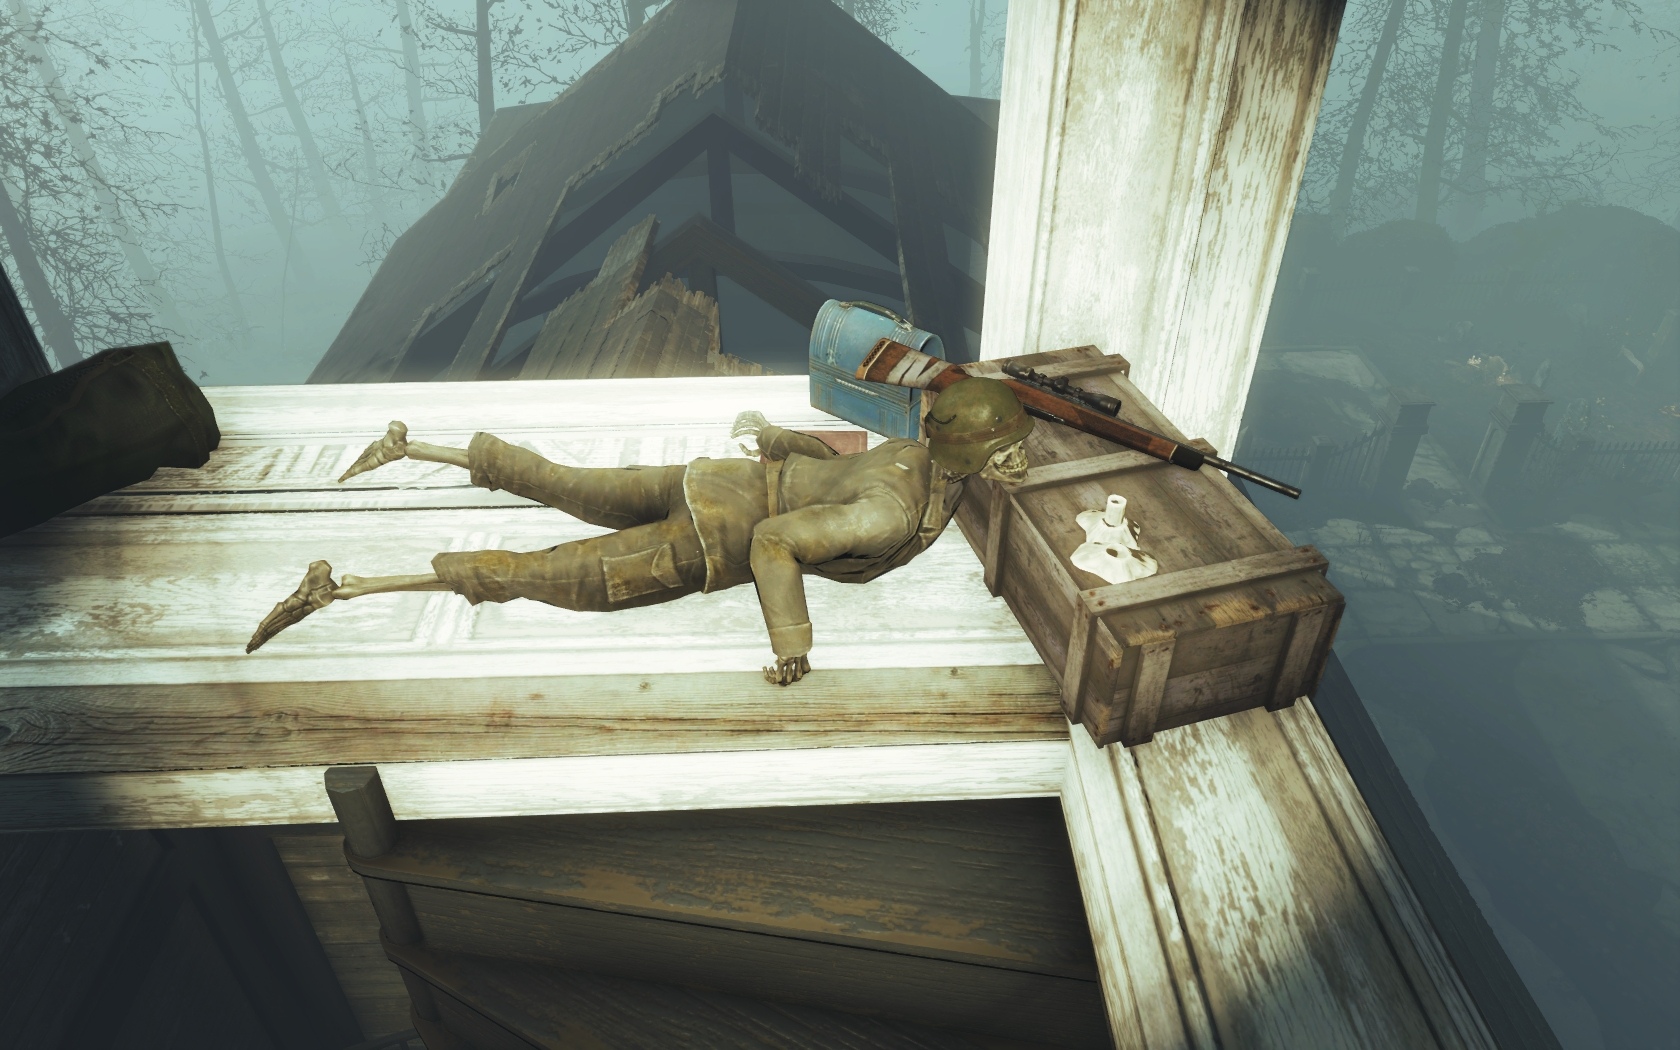 Он умер на боевом посту (Фар-Харбор, Разрушенная церковь) v2 - Fallout 4 скелет